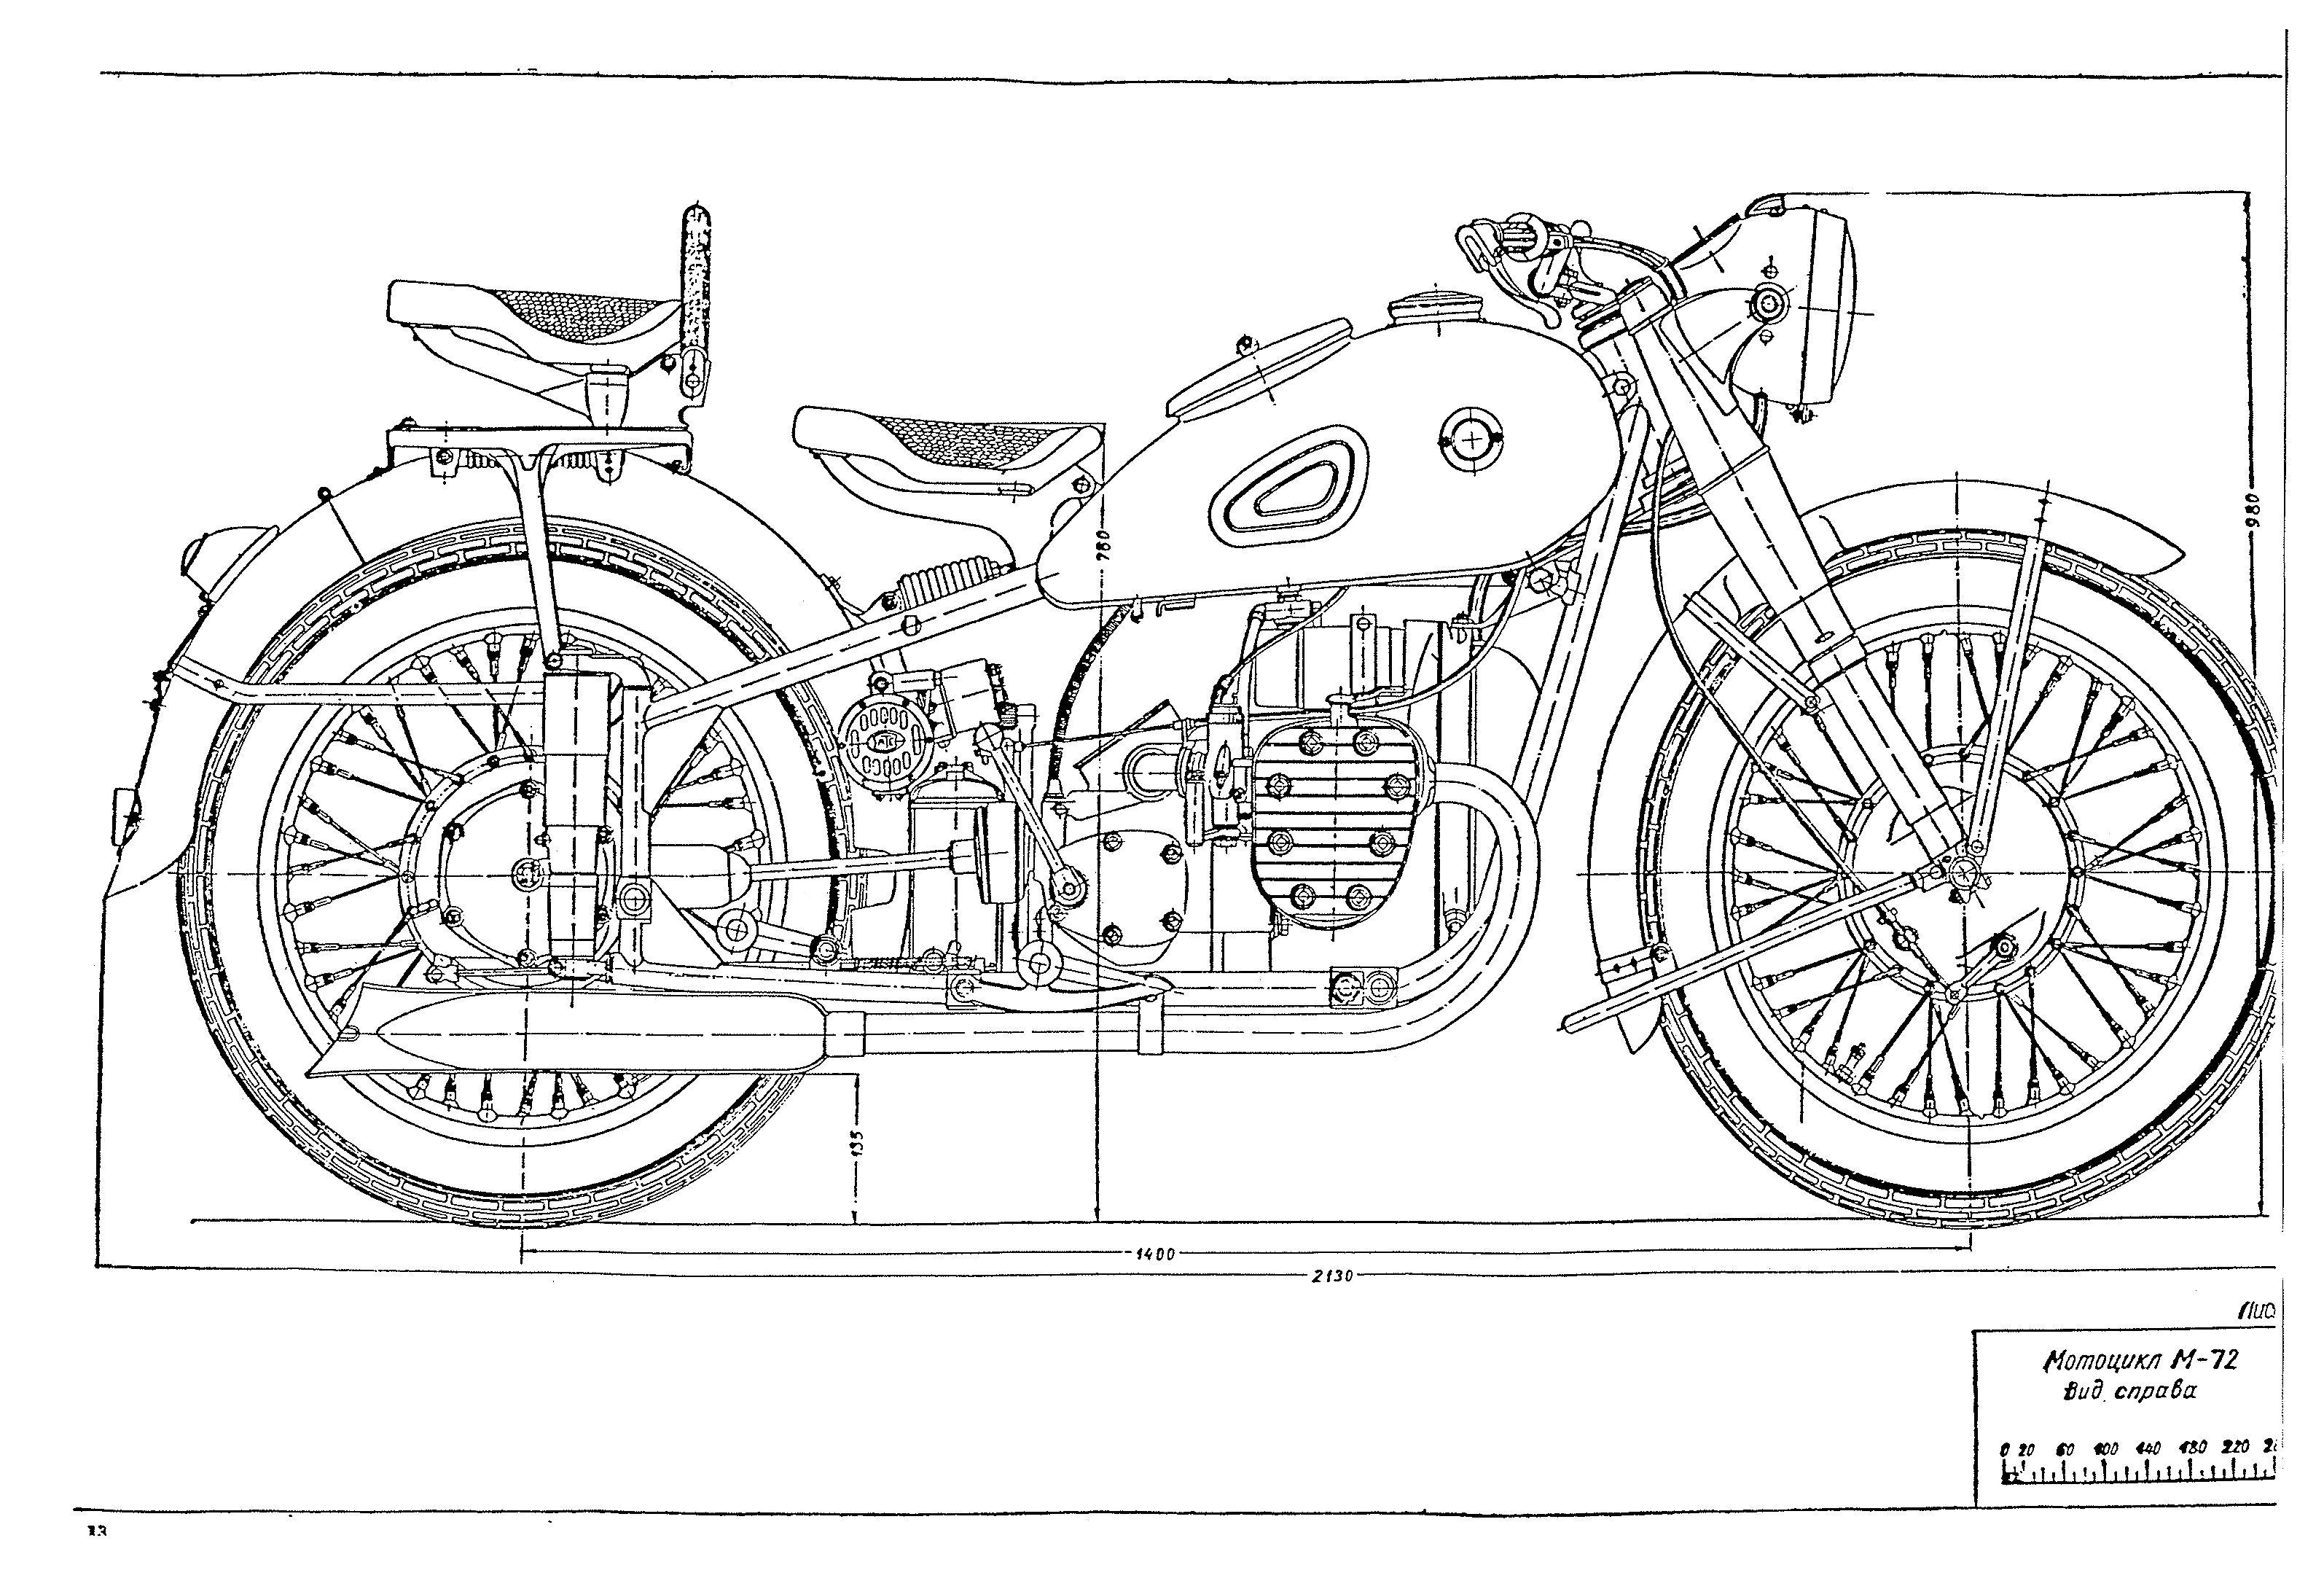 motorcycle blueprints google search [ 3189 x 2169 Pixel ]